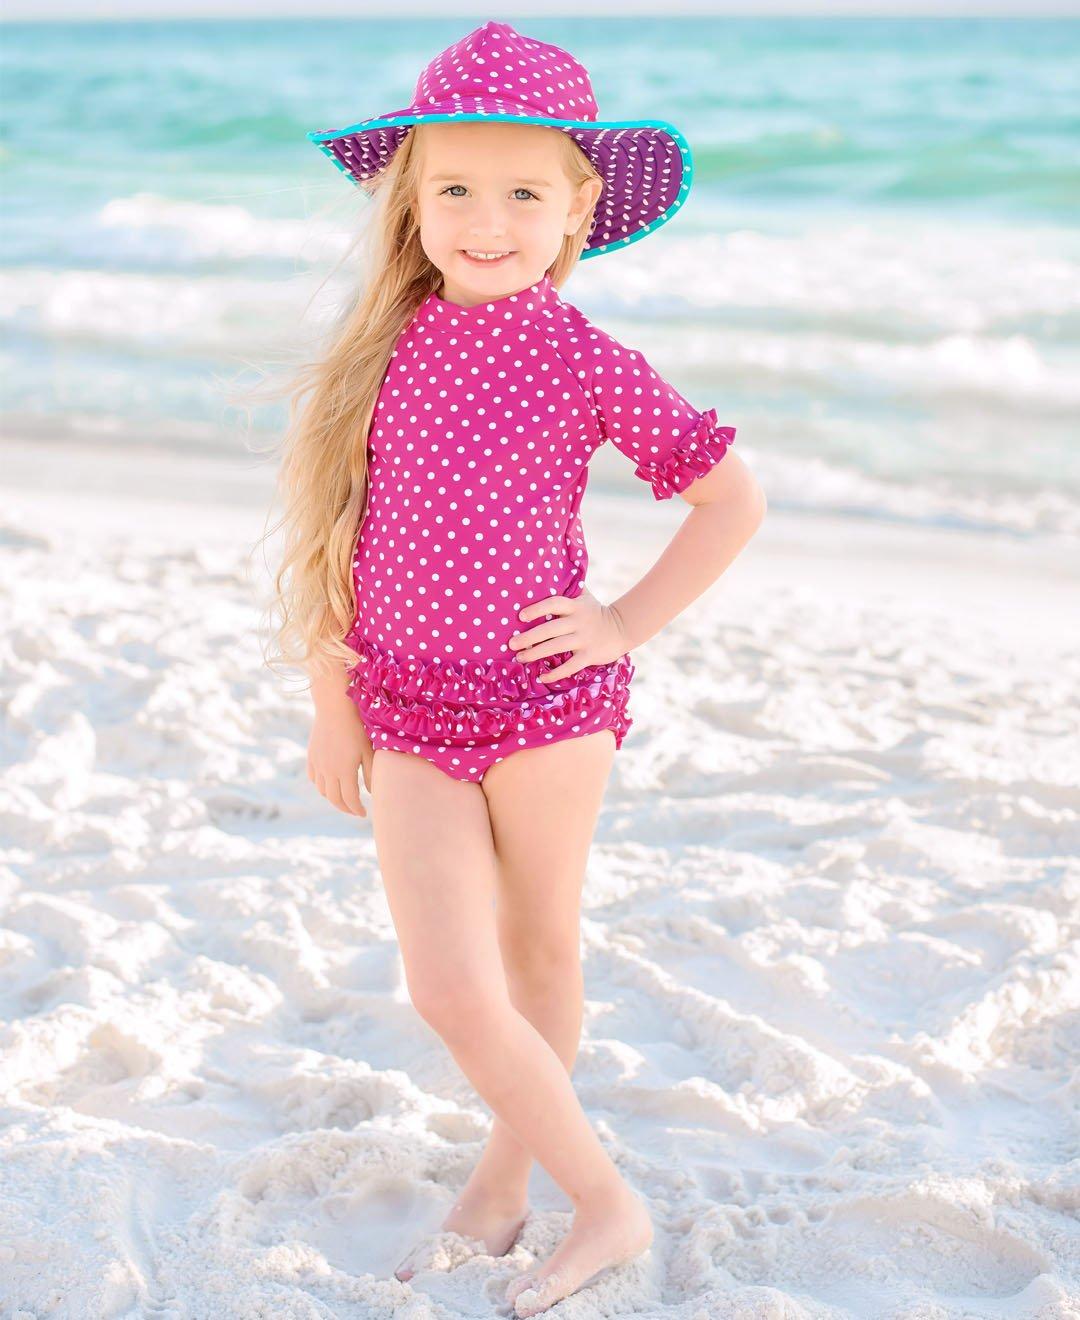 RuffleButts Little Girls Rash Guard 2-Piece Swimsuit Set - Berry Polka Dot Bikini with UPF 50+ Sun Protection - 3T by RuffleButts (Image #2)